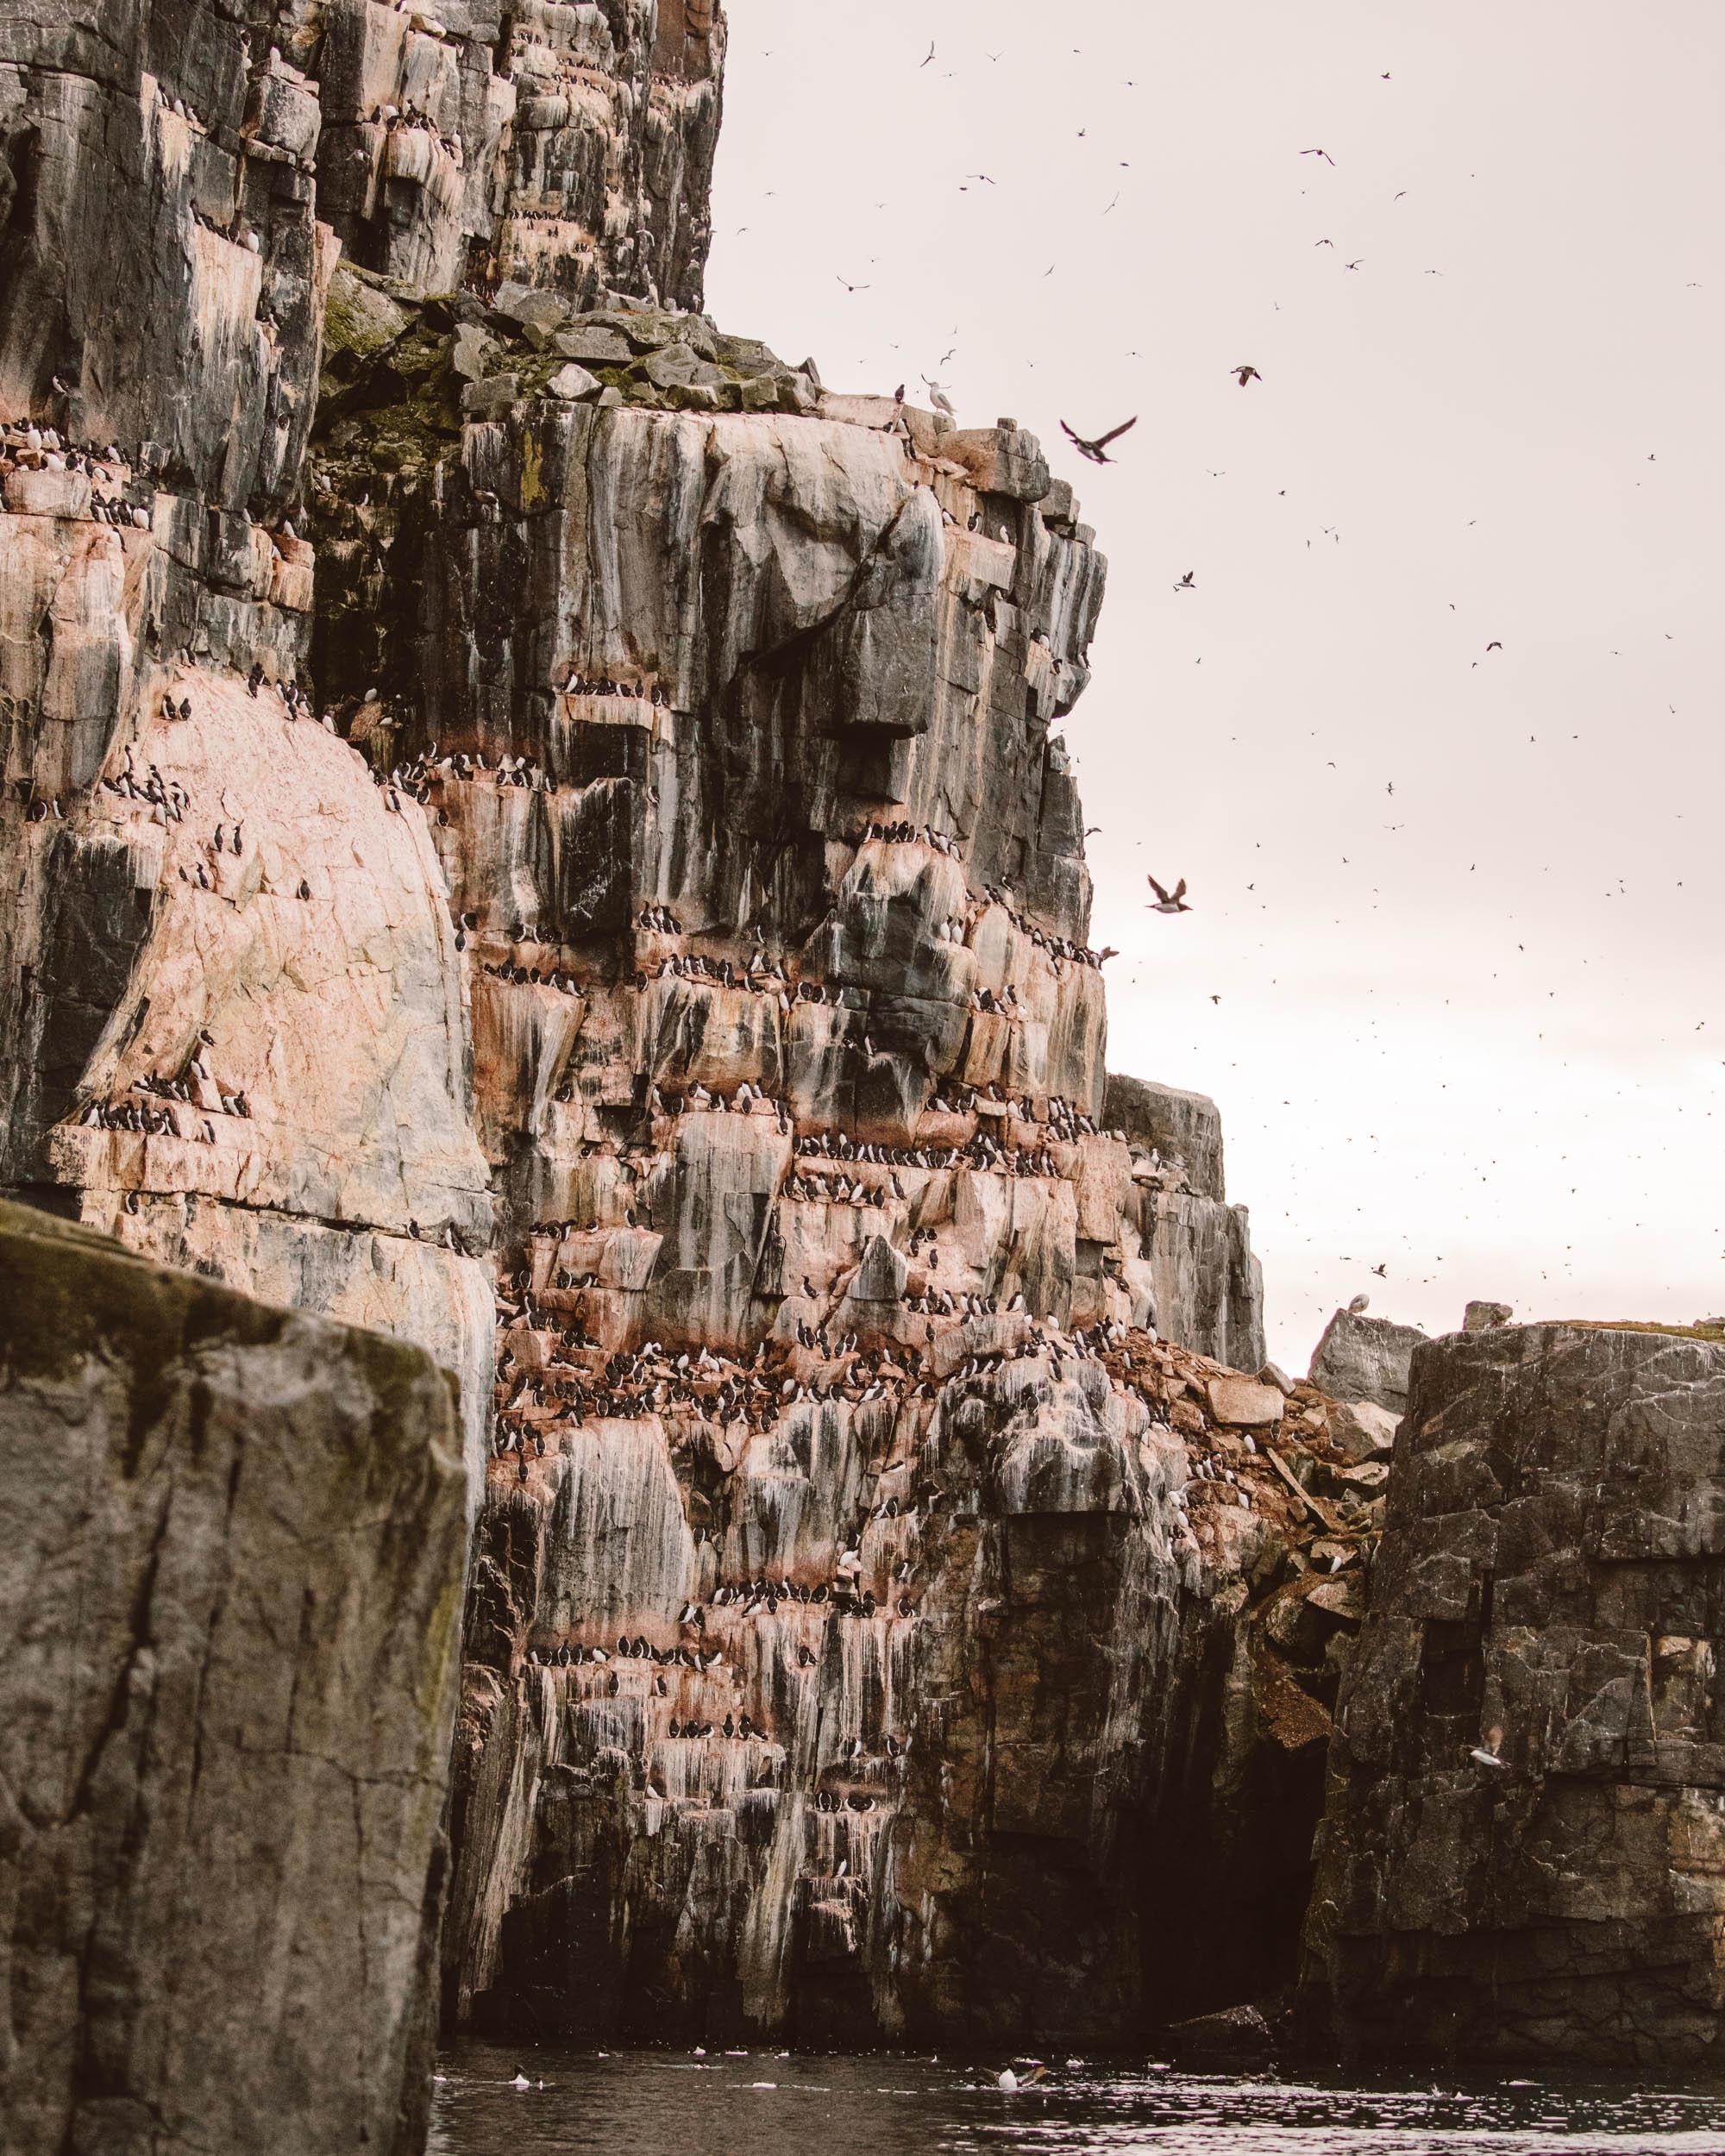 Alkefjellet bird cliffs Lomfjordhalvøya in Ny Friesland at Spitsbergen, Svalbard via Find Us Lost